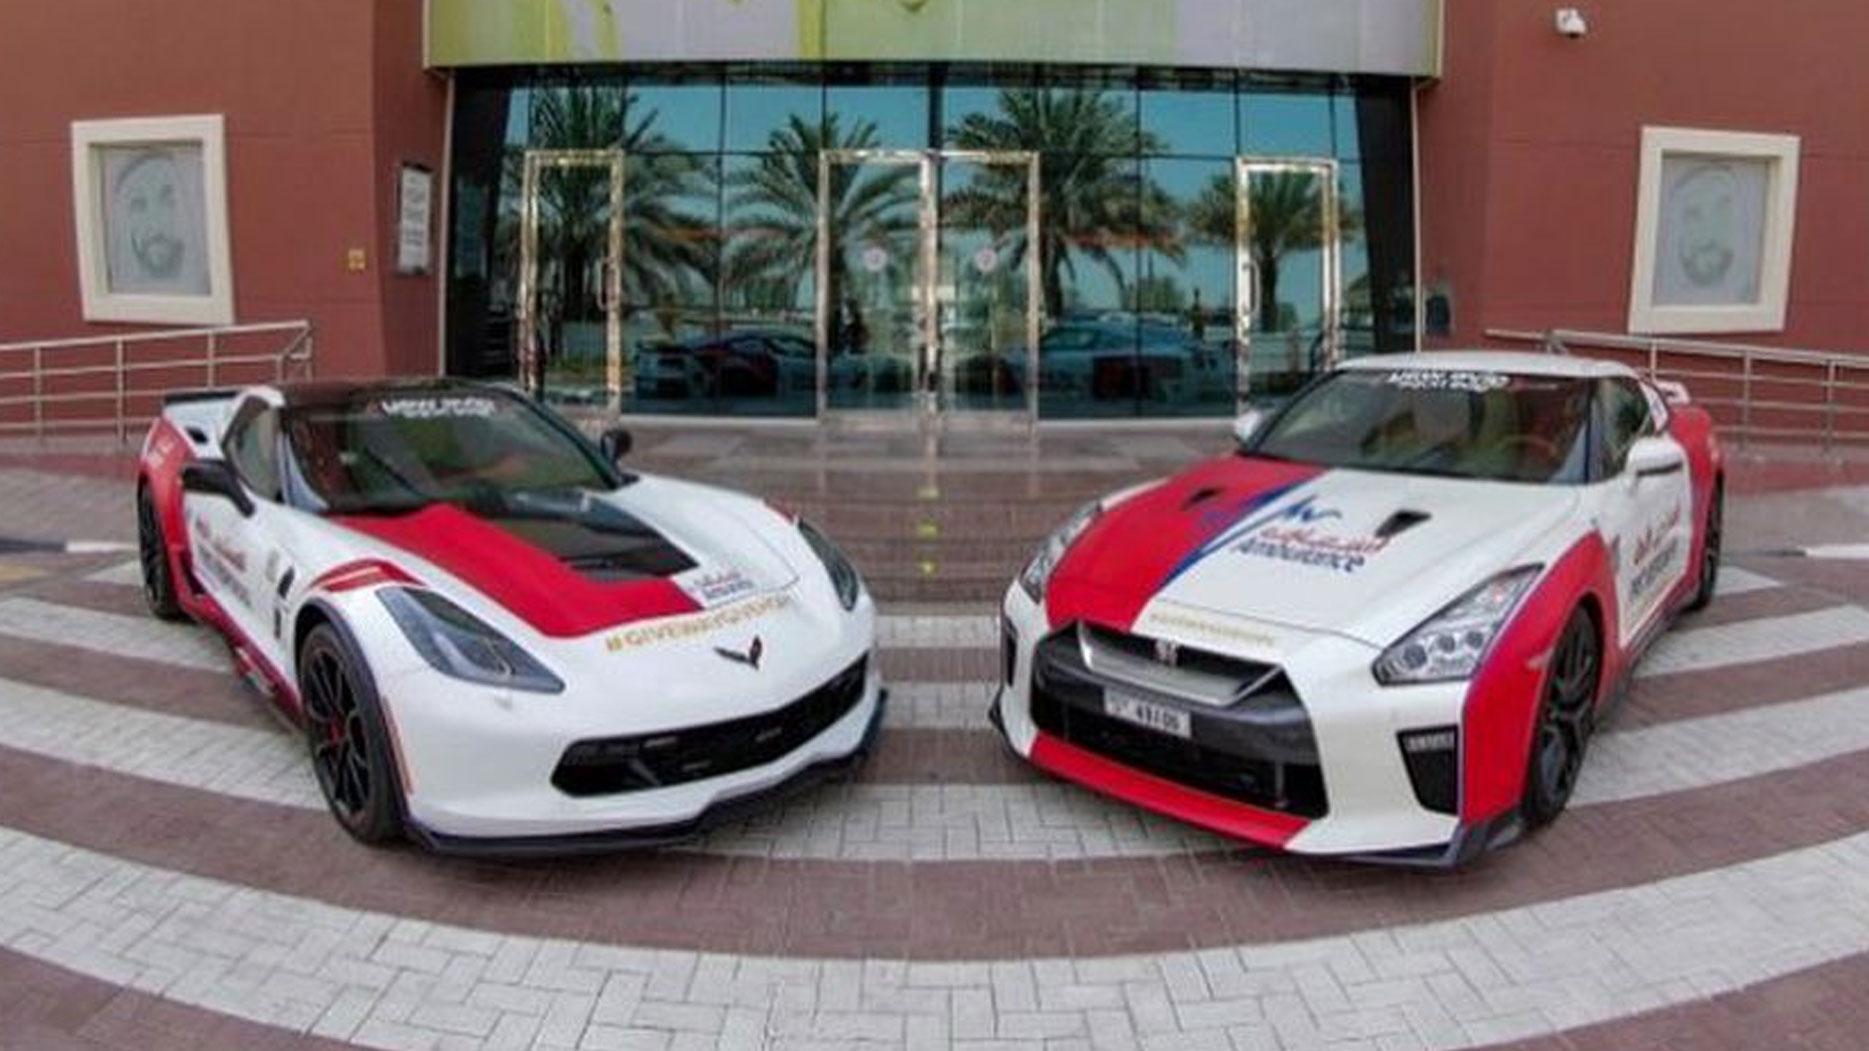 Foto:  Dubai Corporation For Ambulance Services